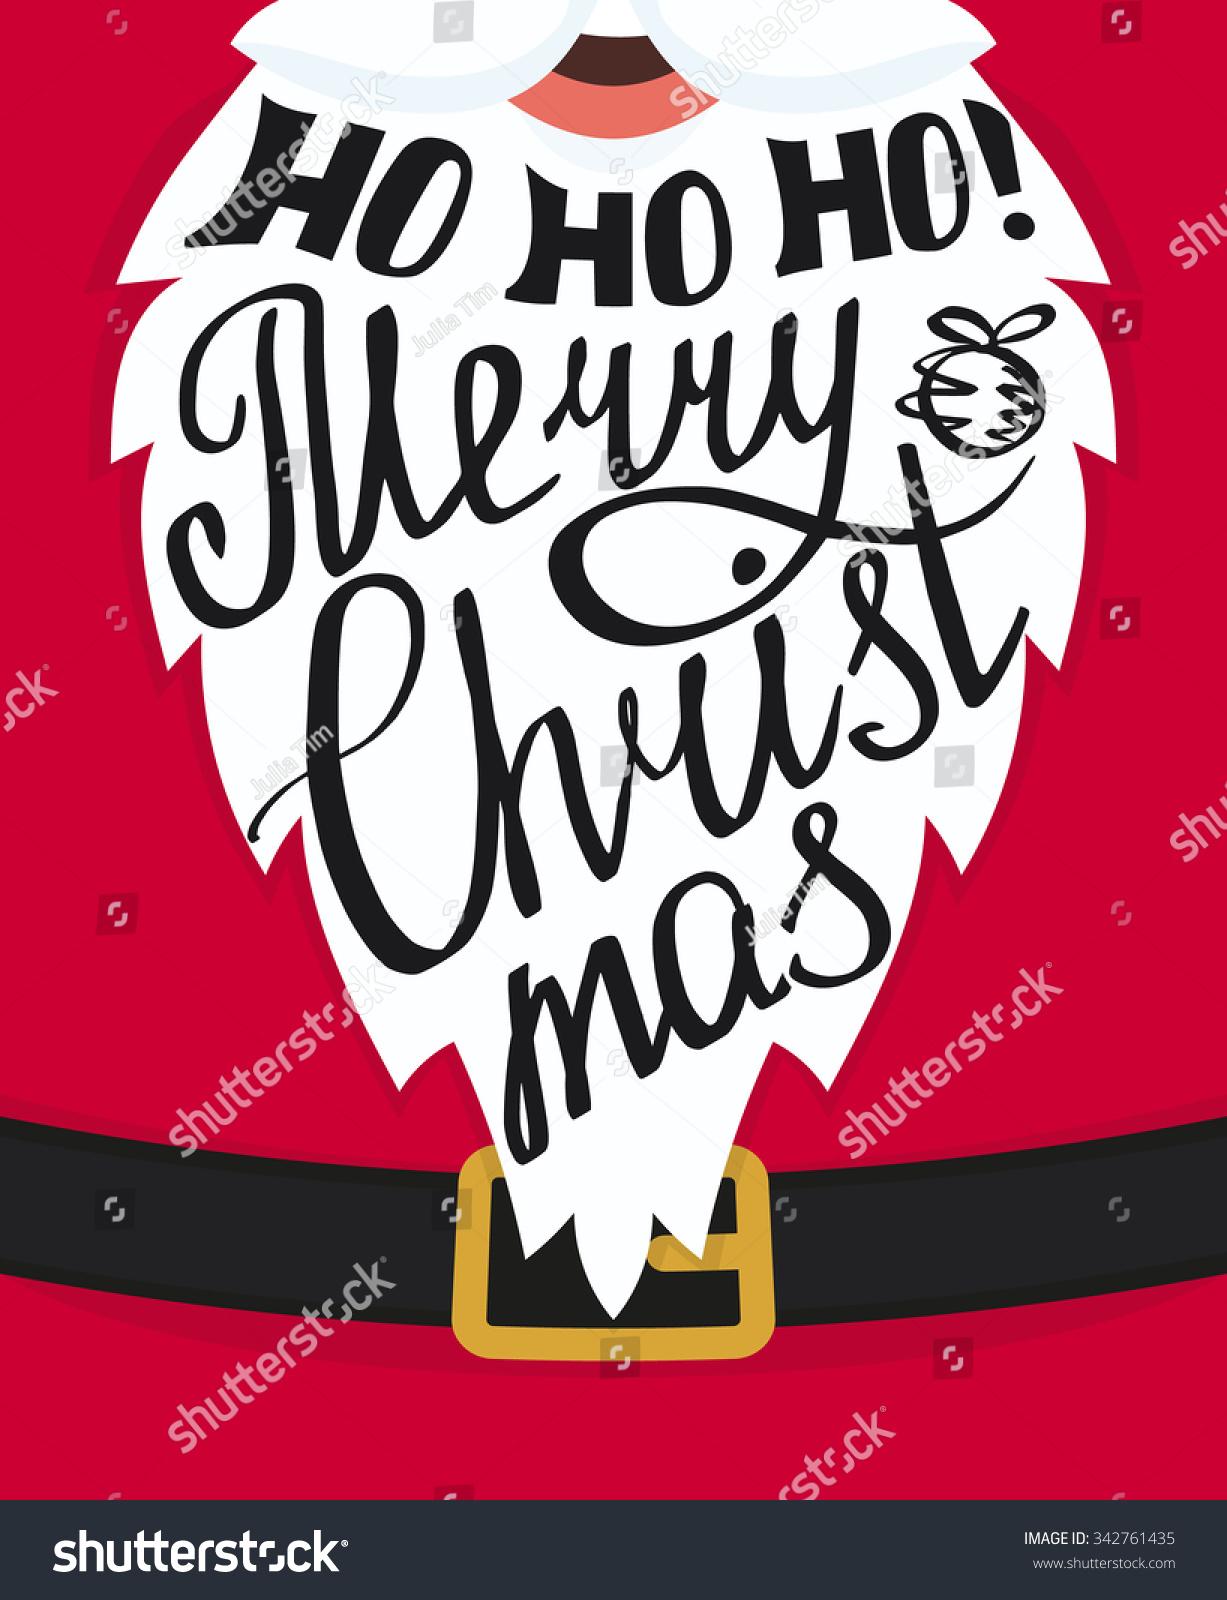 ho ho ho merry christmas handmade lettering on the santa claus white beard xmas greeting - Hohoho Merry Christmas